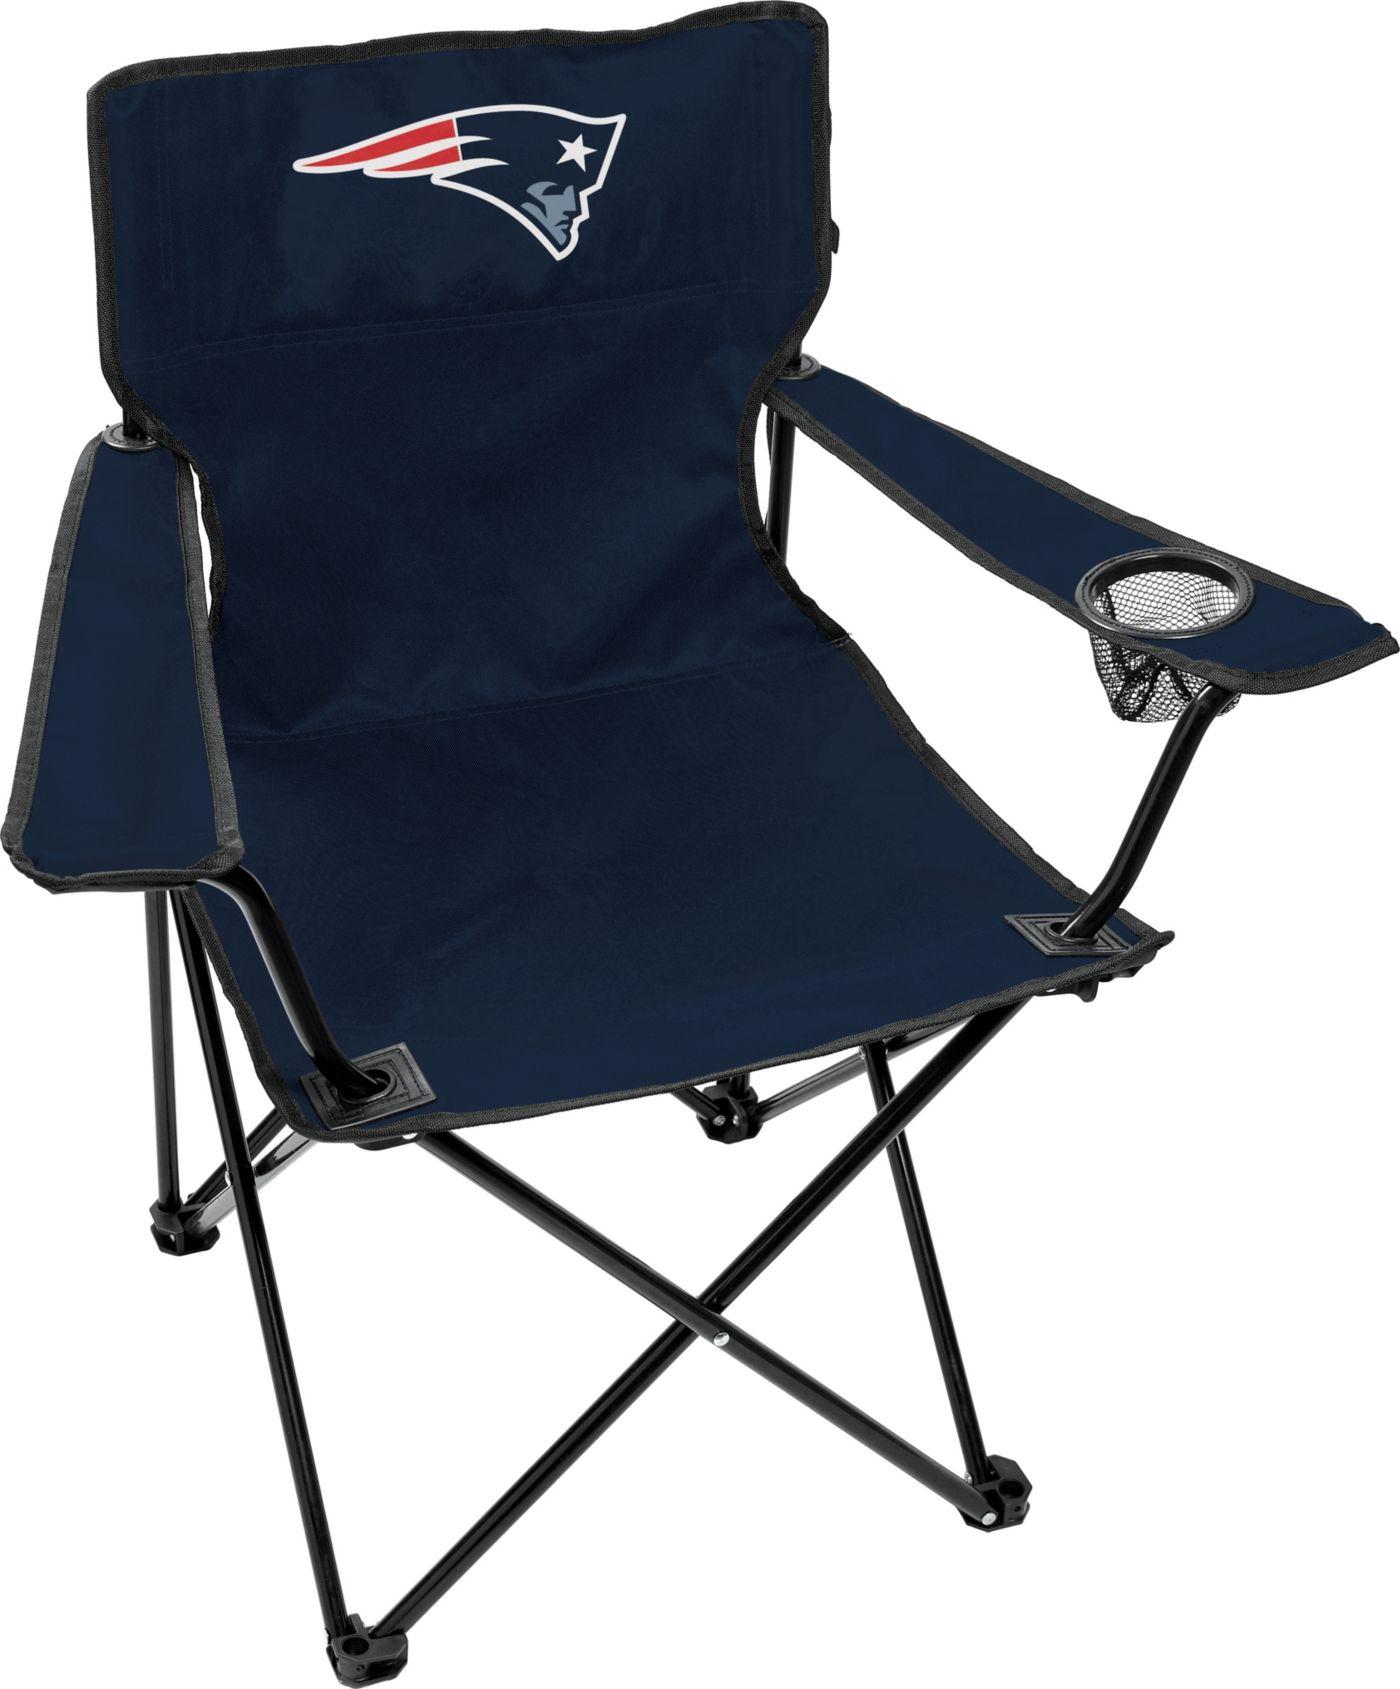 Rawlings New England Patriots Game Day Elite Quad Chair